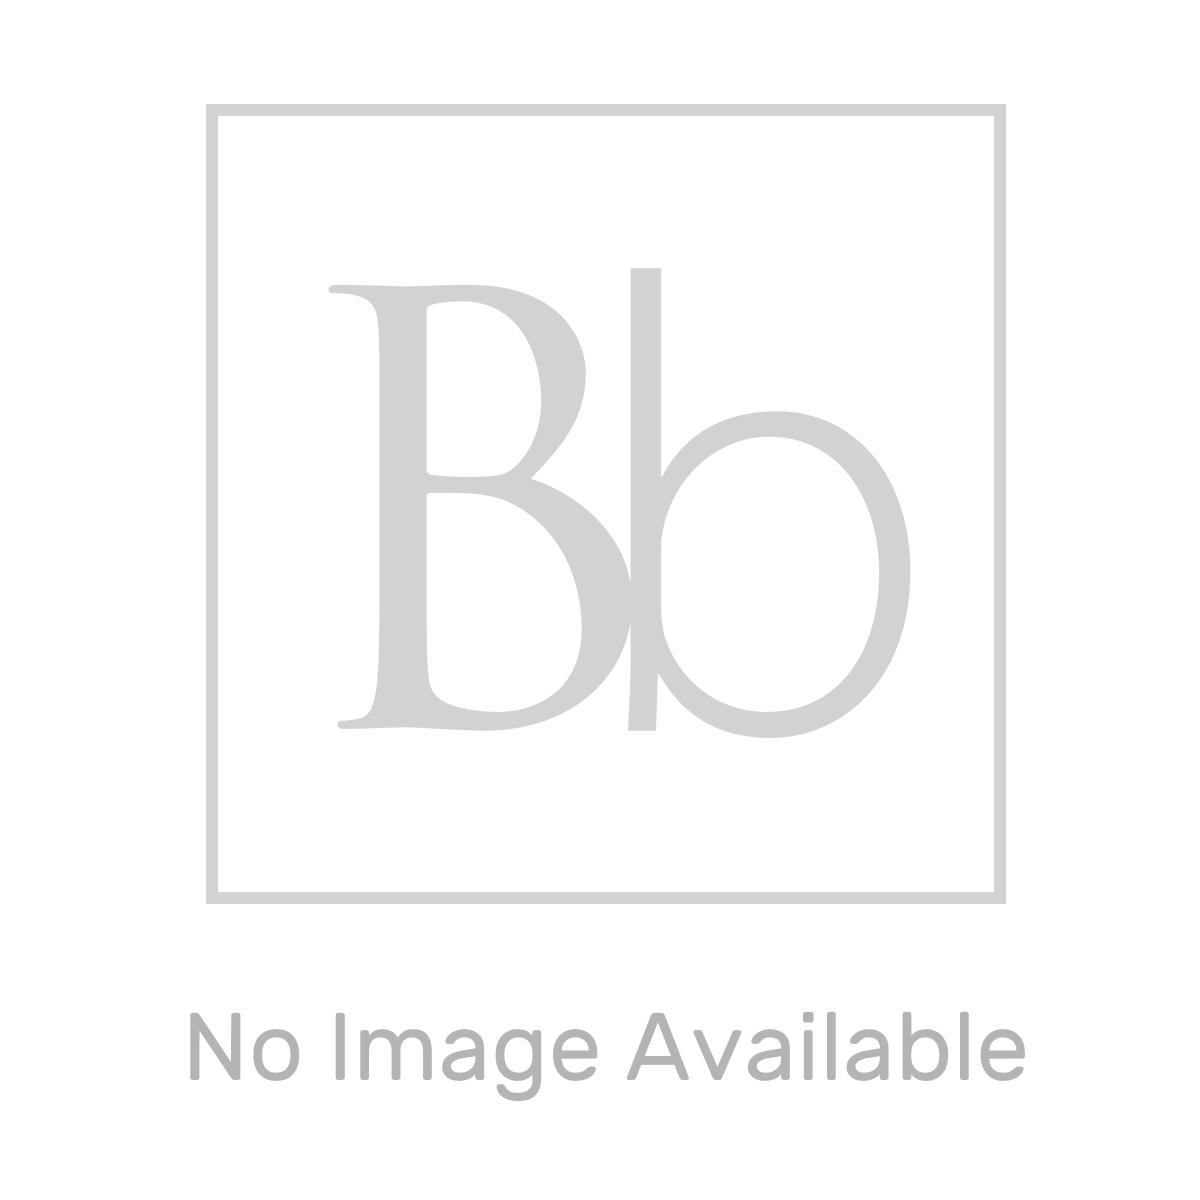 RAK Straight Grab Rail 300mm Measurements